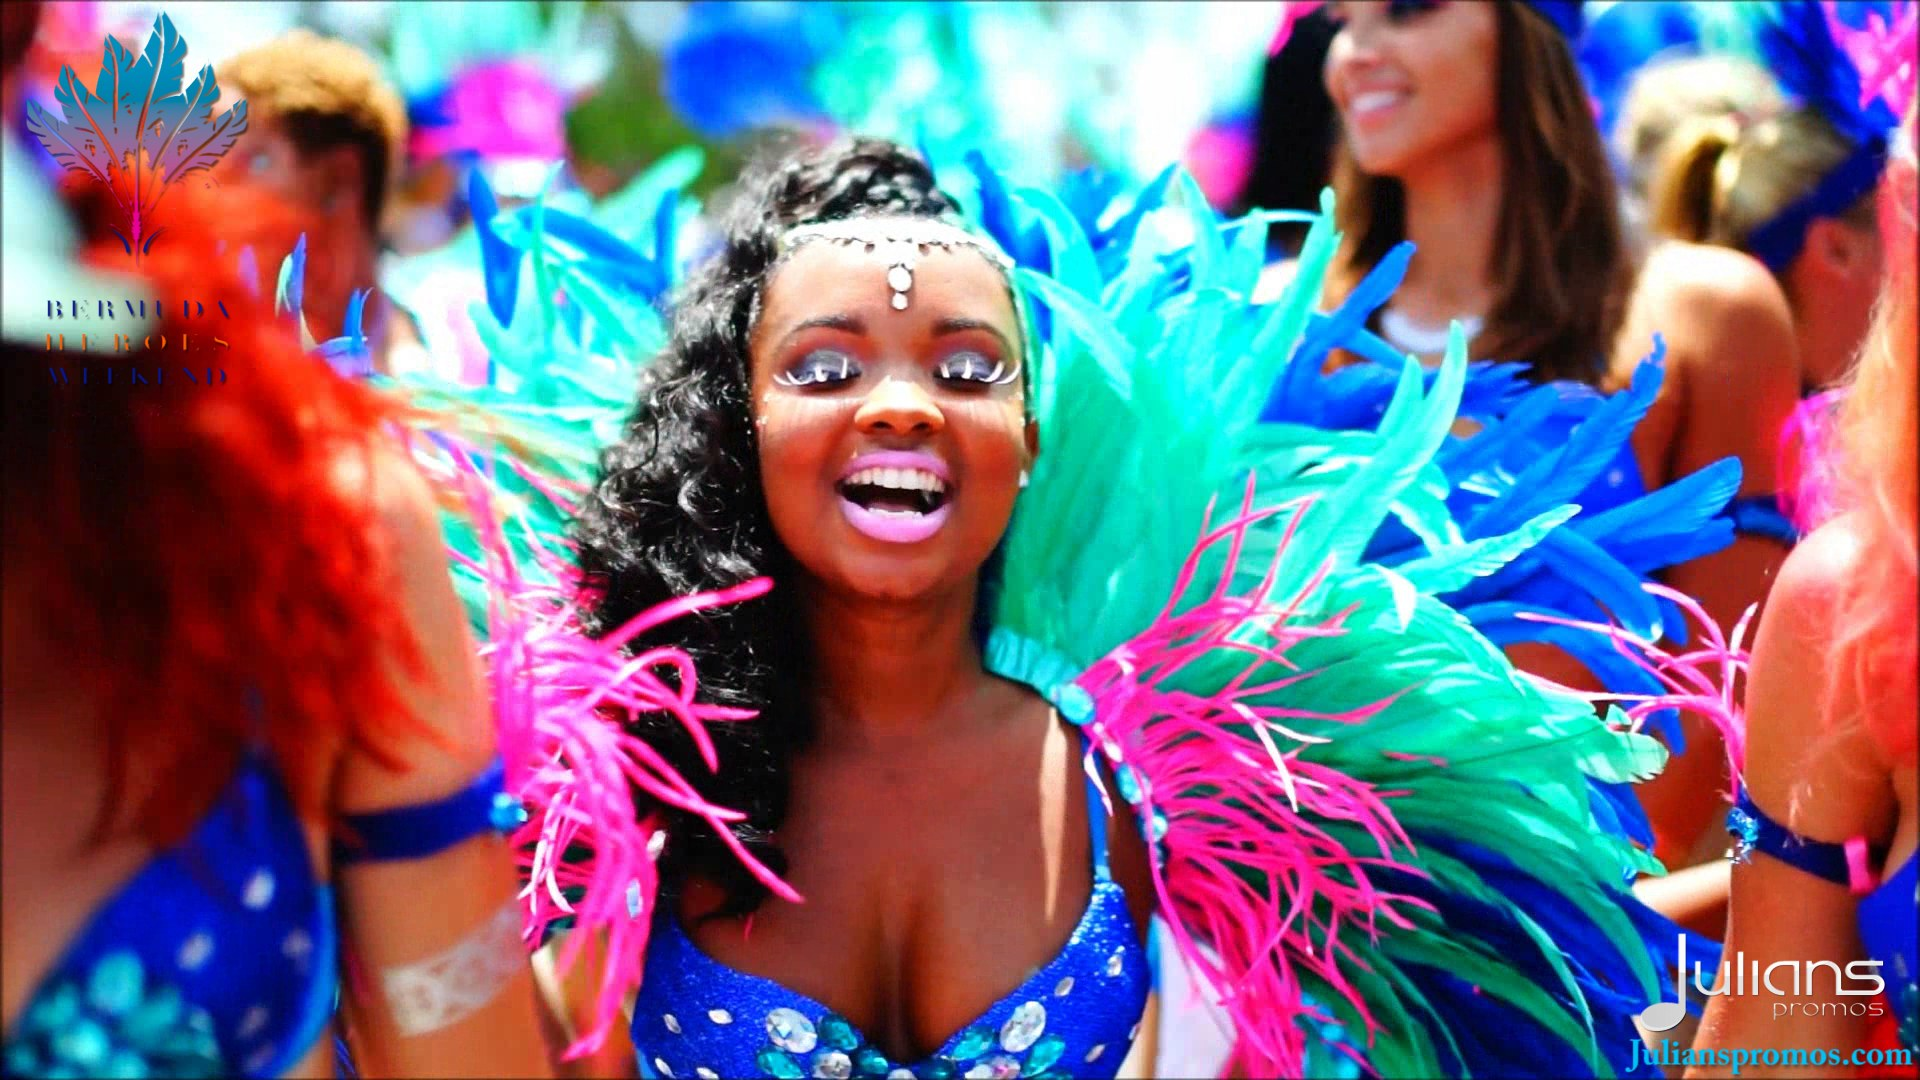 2015 Bermuda Carnival 08 Julianspromos Web Site